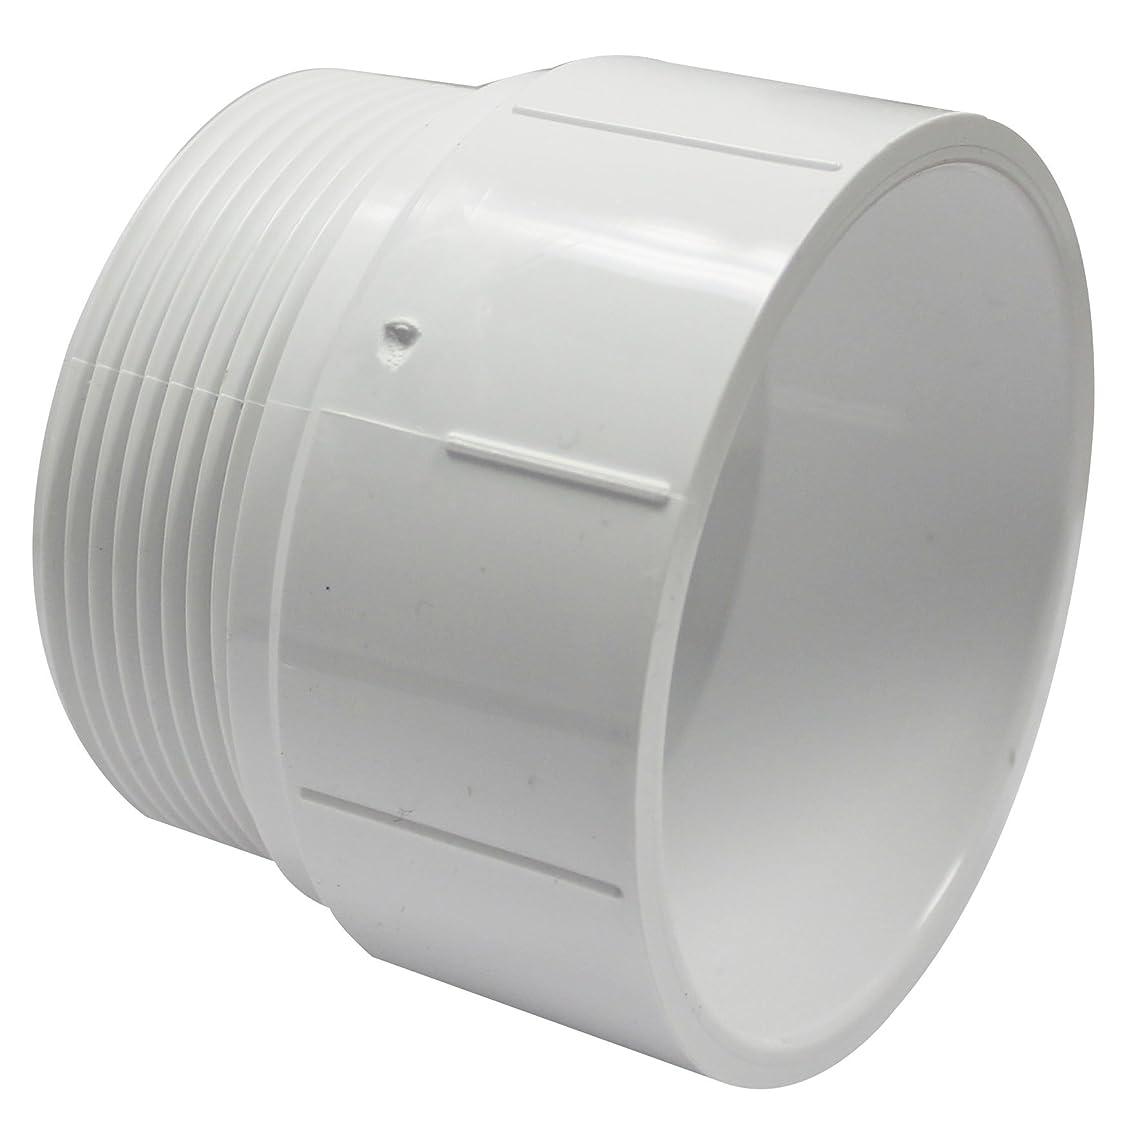 Canplas 192873 PVC DWV Male Adapter, 3-Inch, White